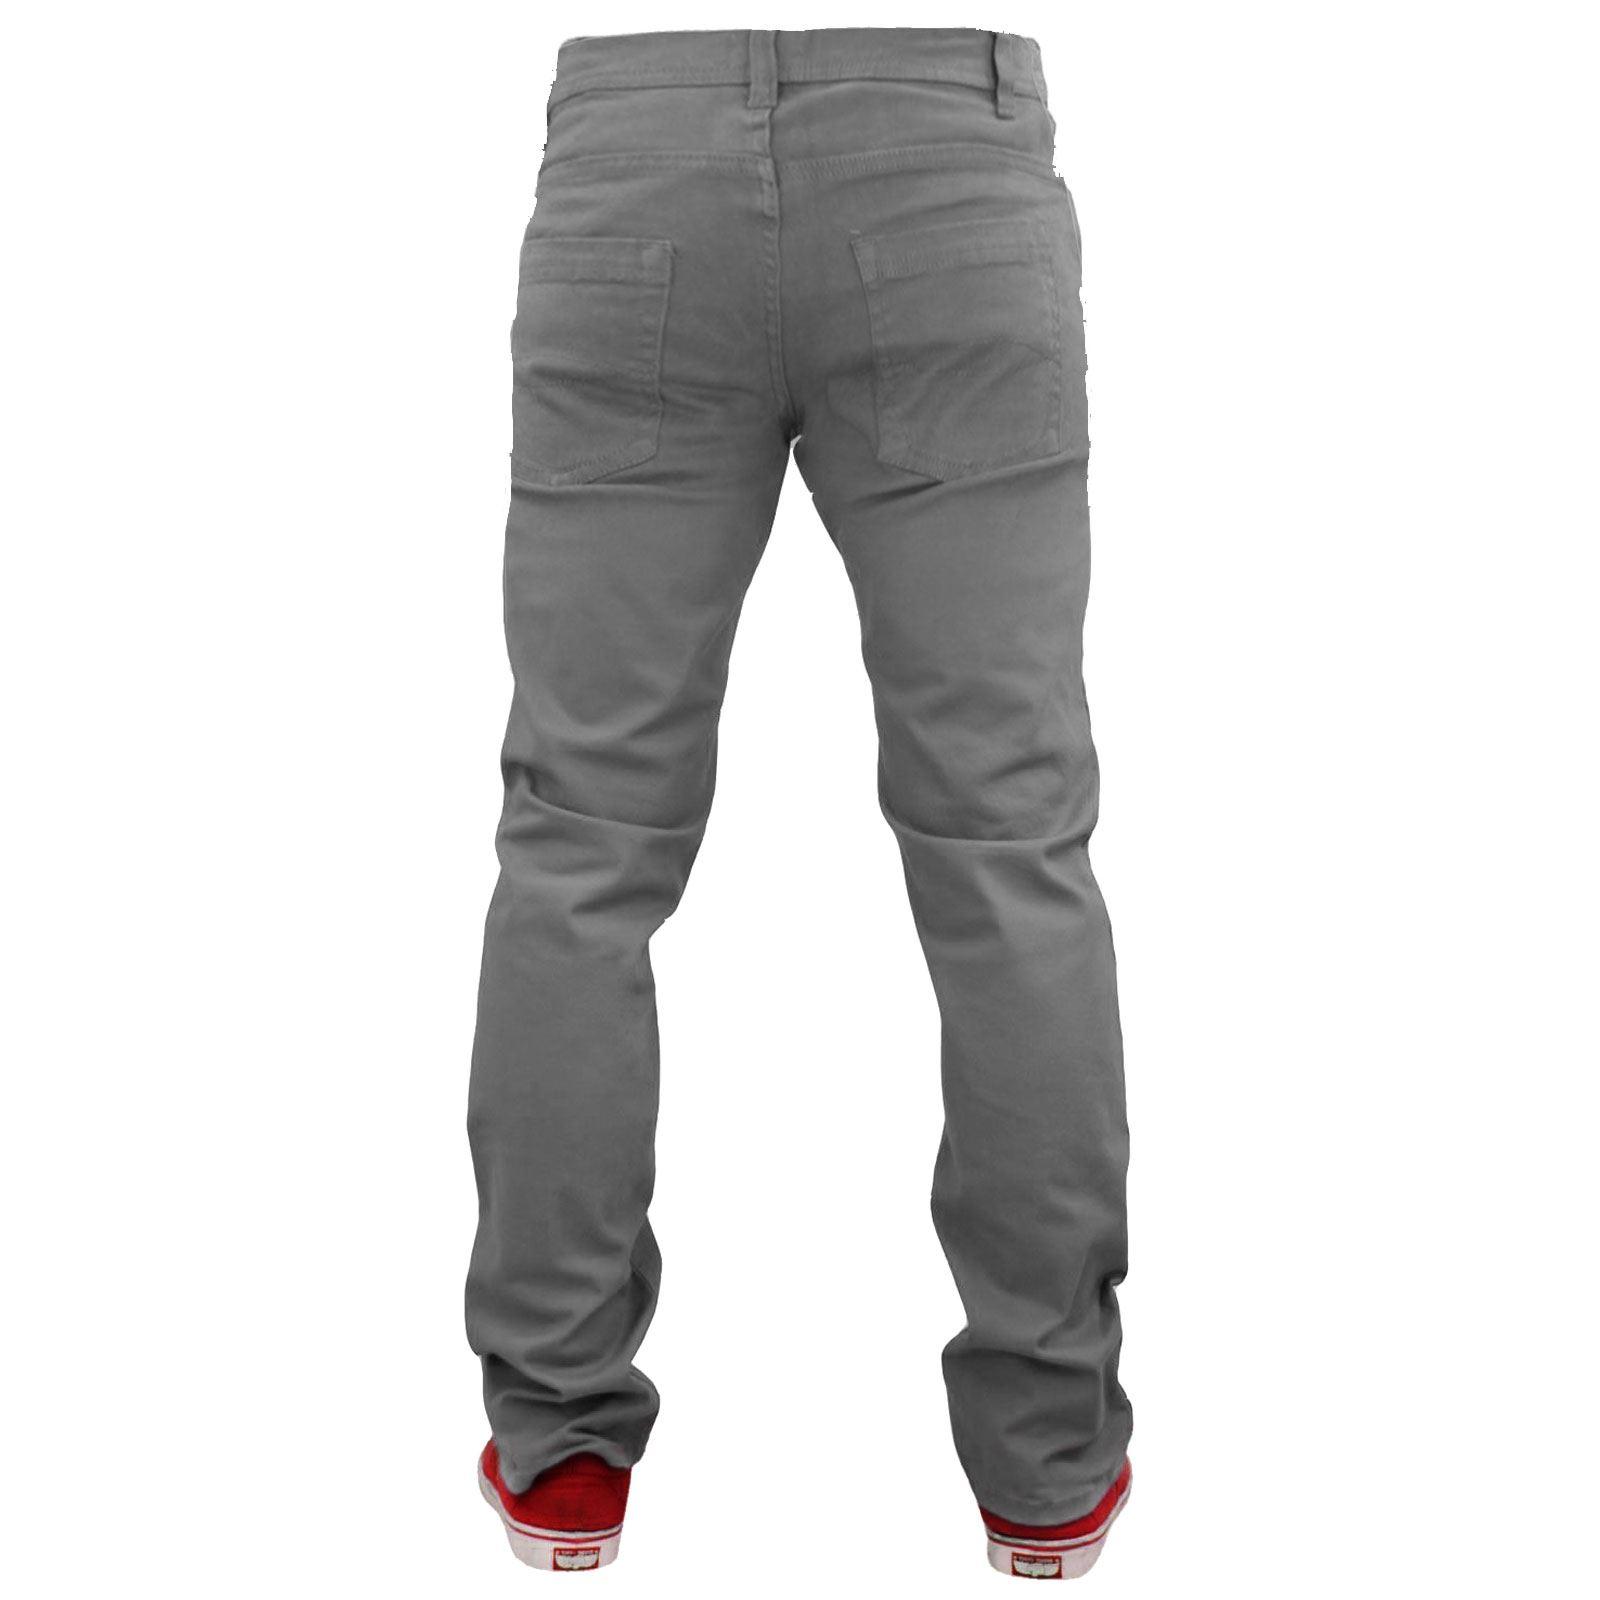 Herren Designer Jack South Baumwolltwill Chino Skinny Fit Jeans Stretch